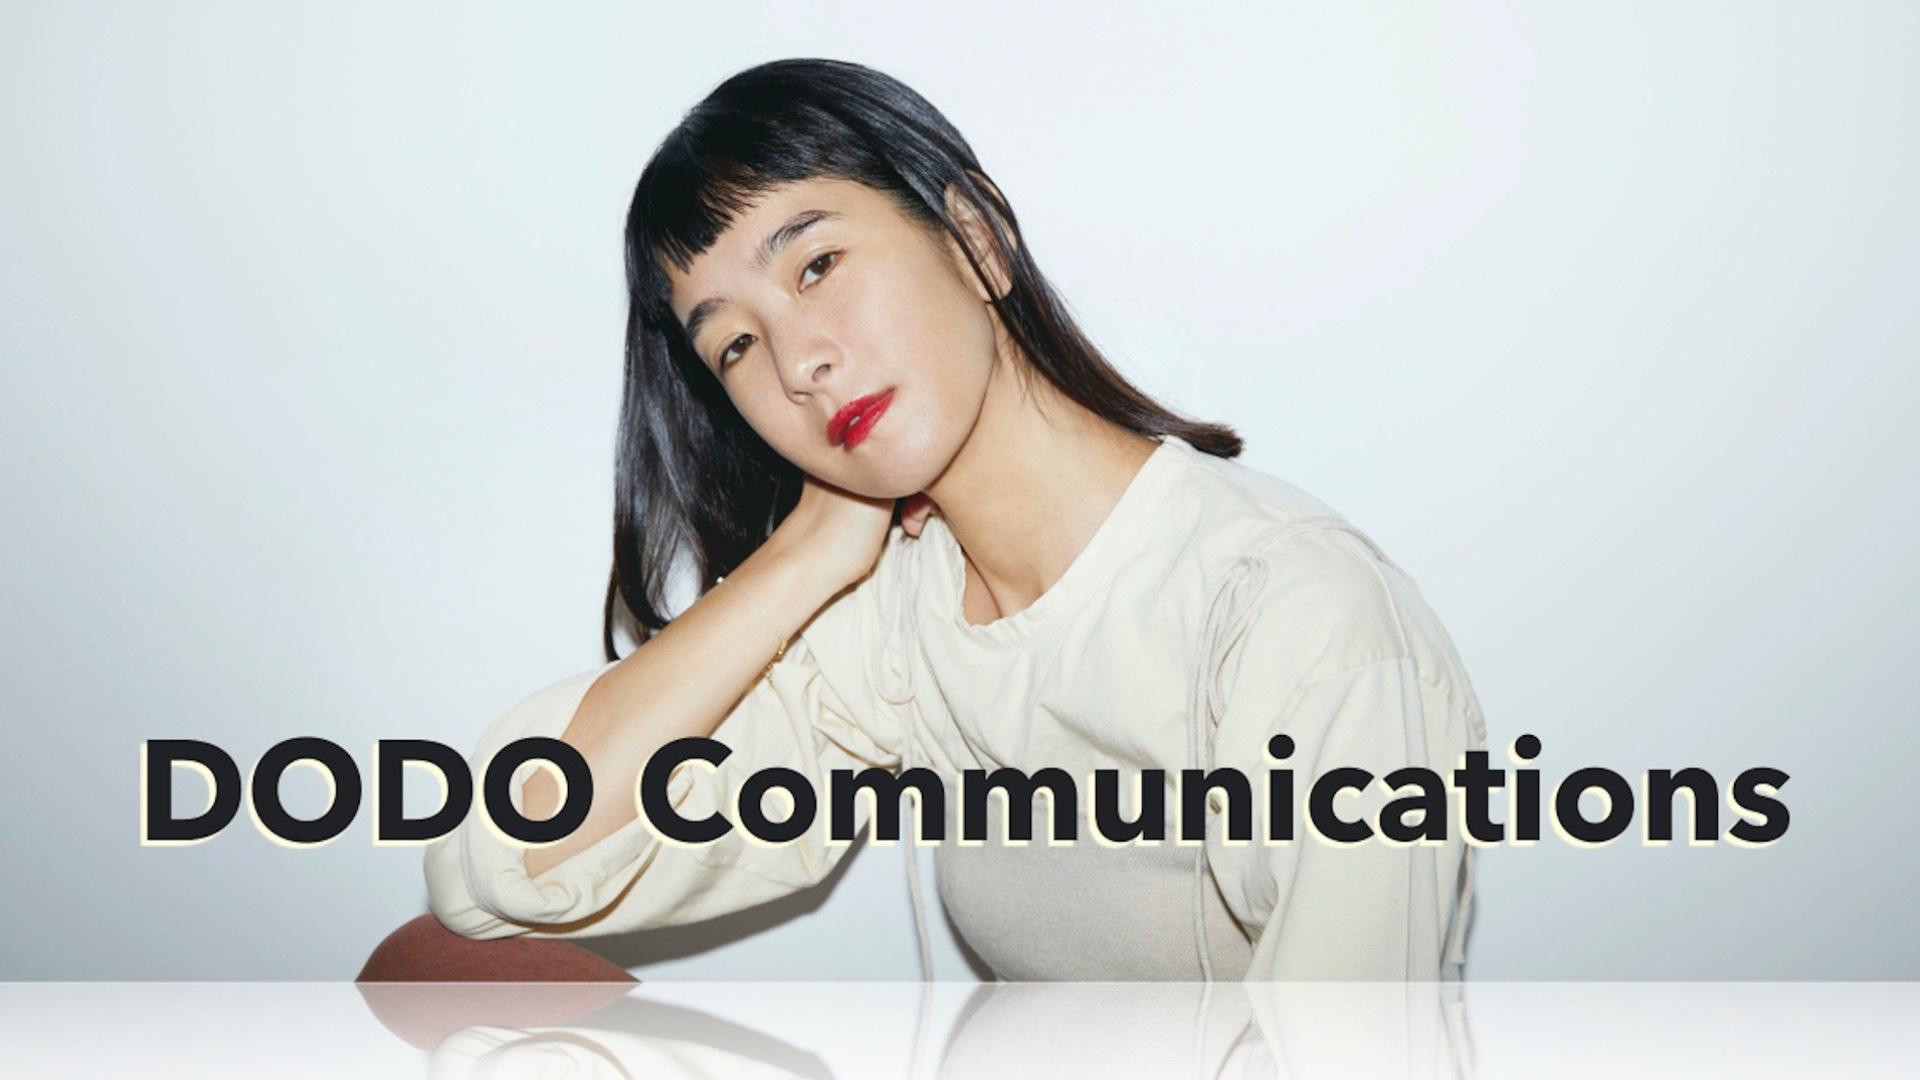 DODO Communications